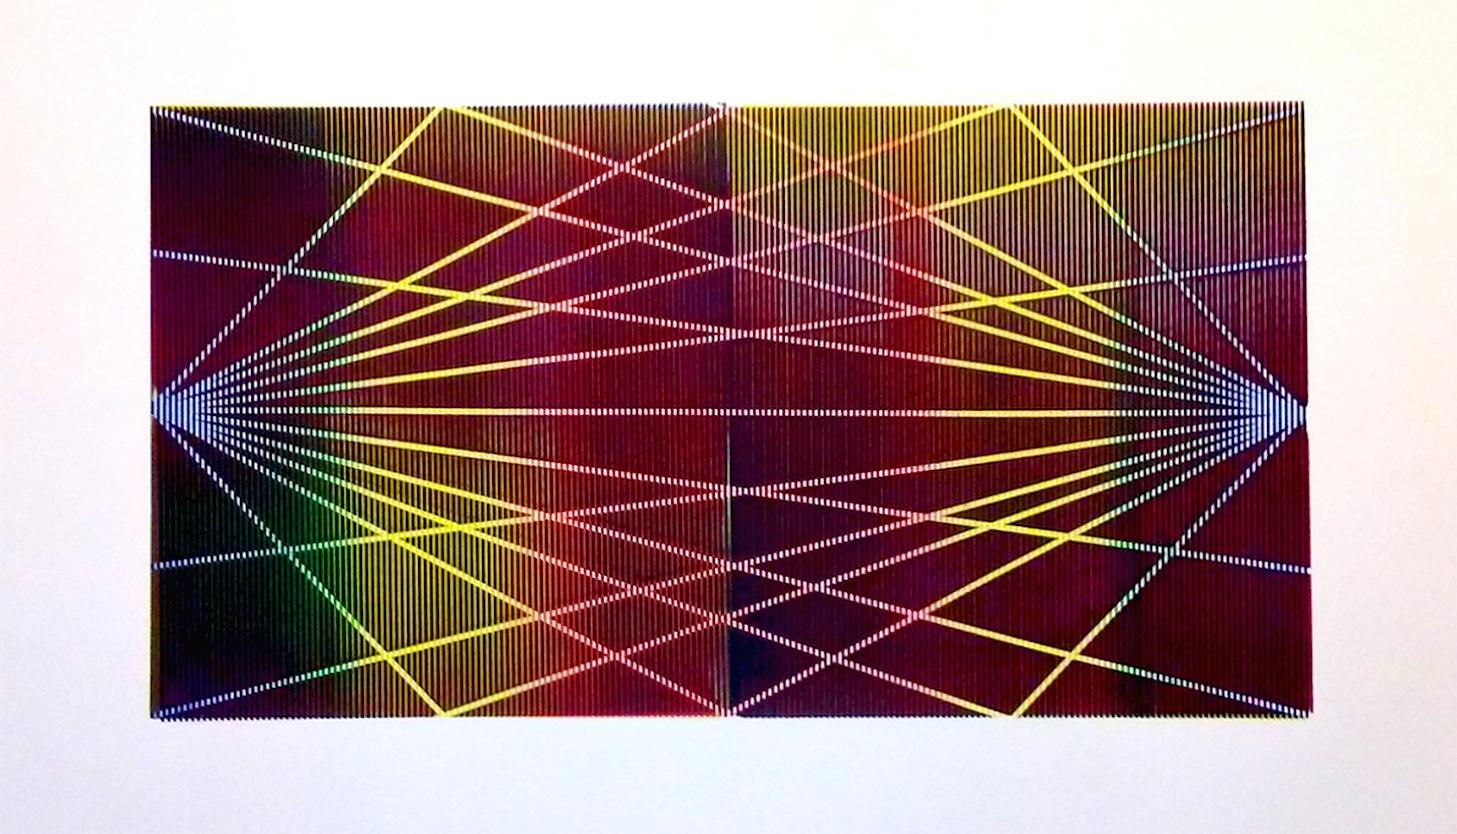 Matti Havens, Stellar Spectrum 2, 2019, Screenprint, 22x39, frame size 30x48 in